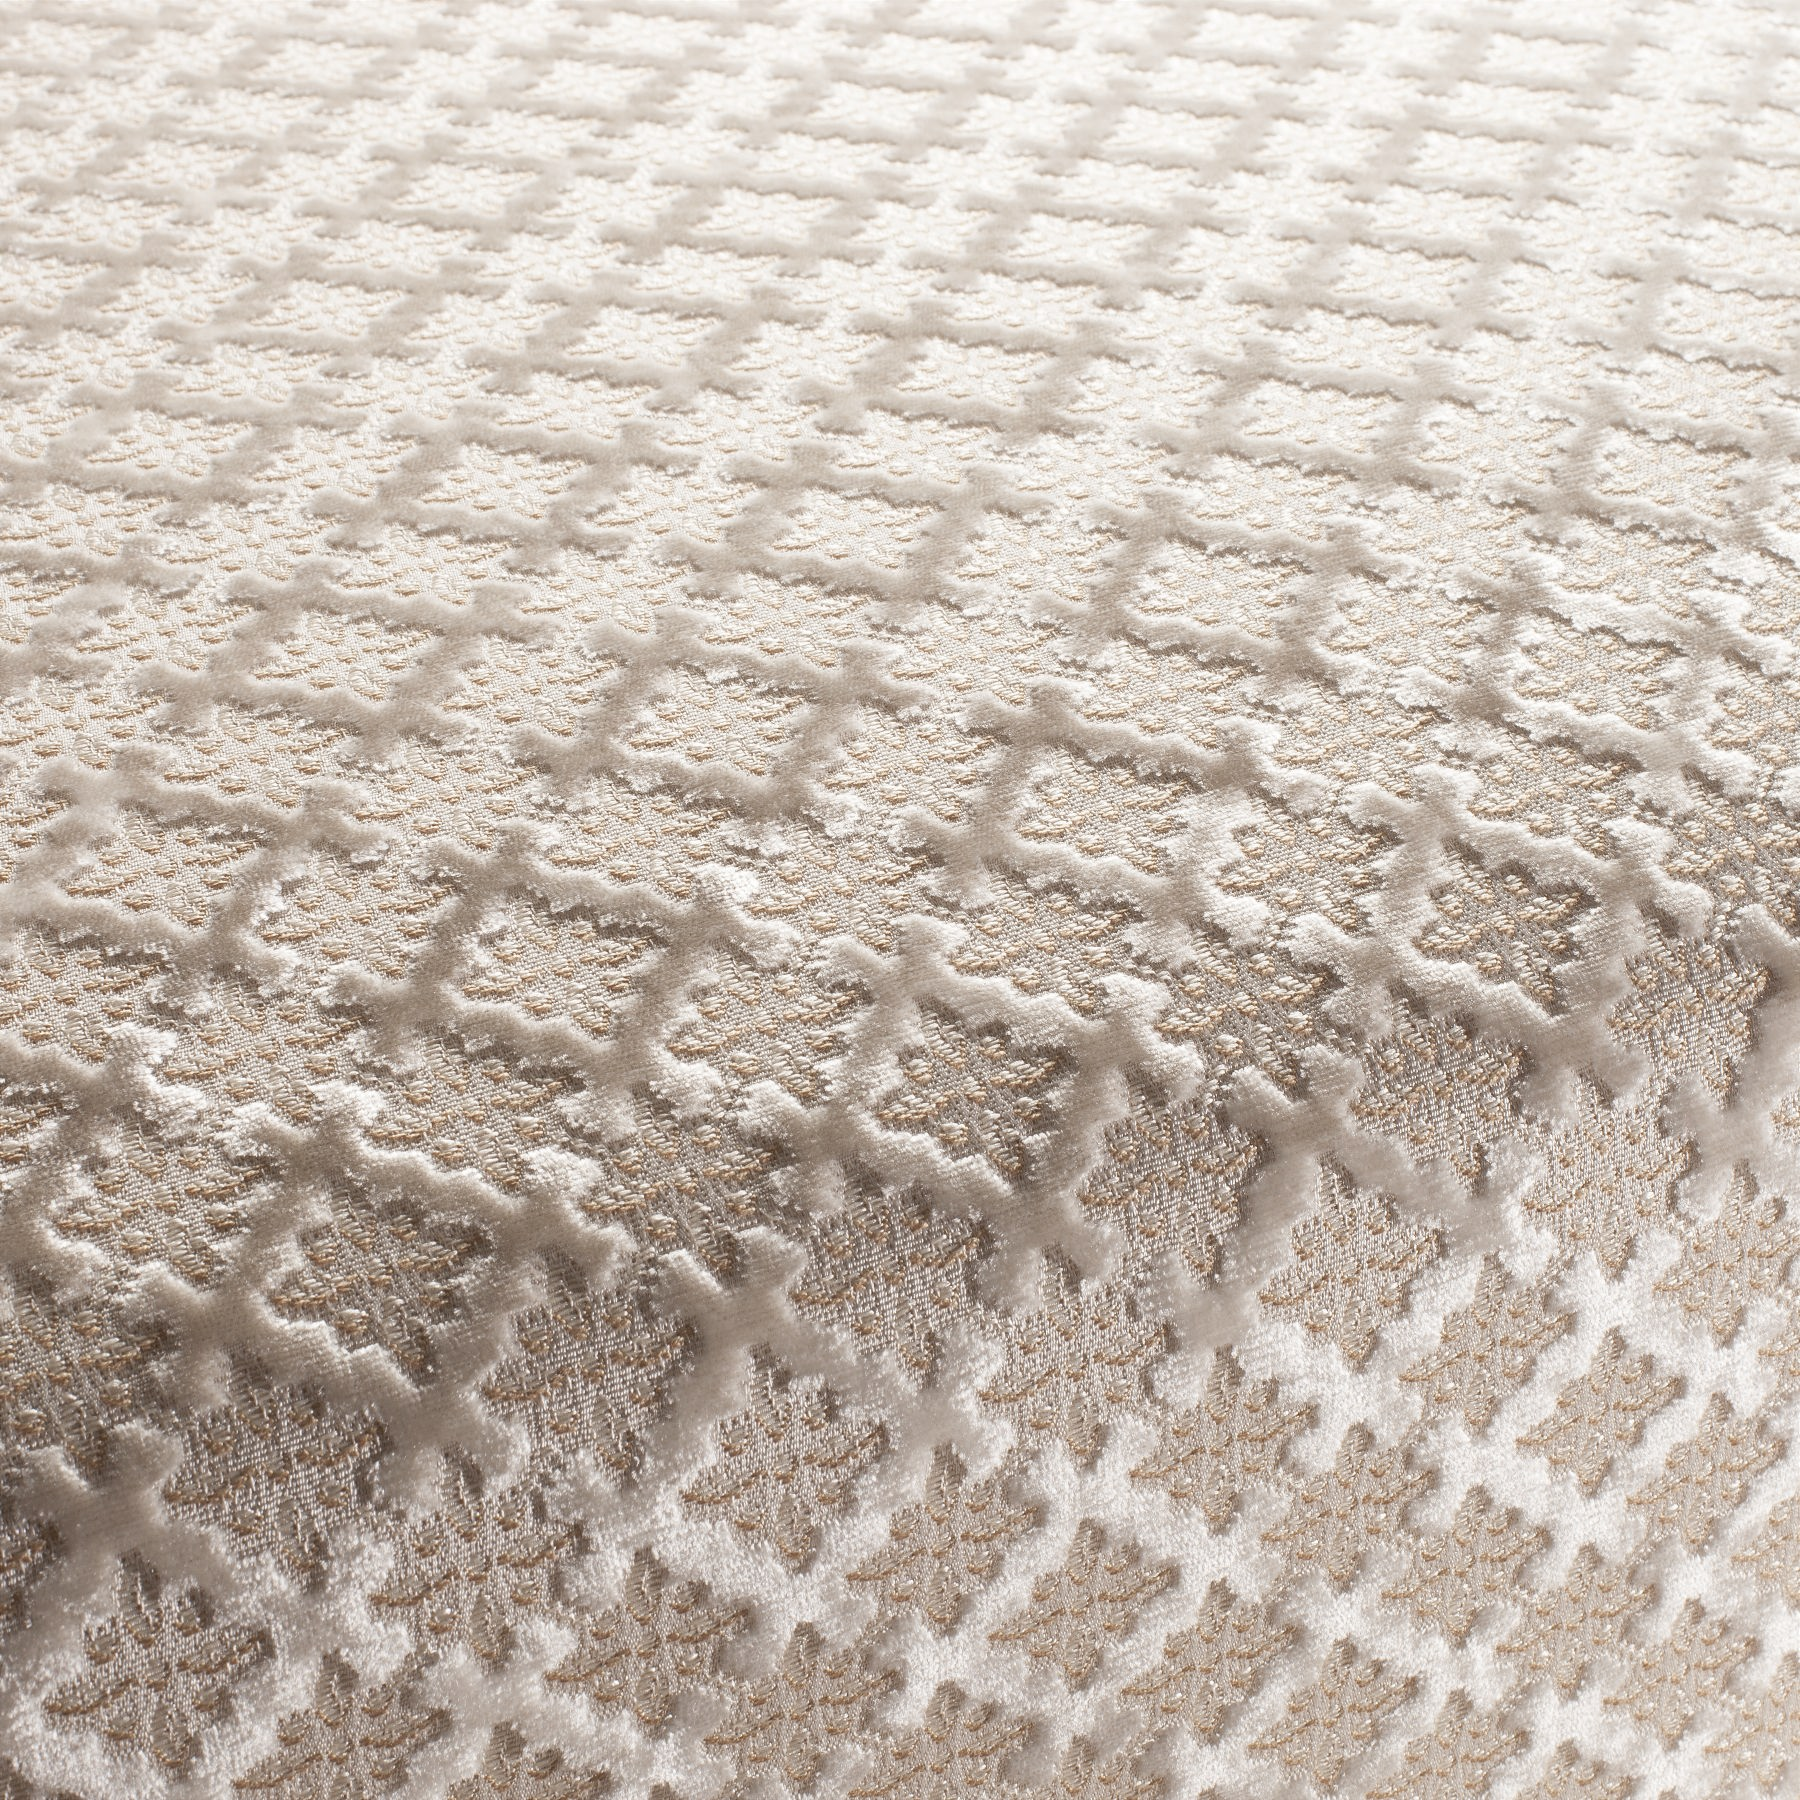 upholstery fabric sanssouci 1 4160 070 jab anstoetz fabrics. Black Bedroom Furniture Sets. Home Design Ideas